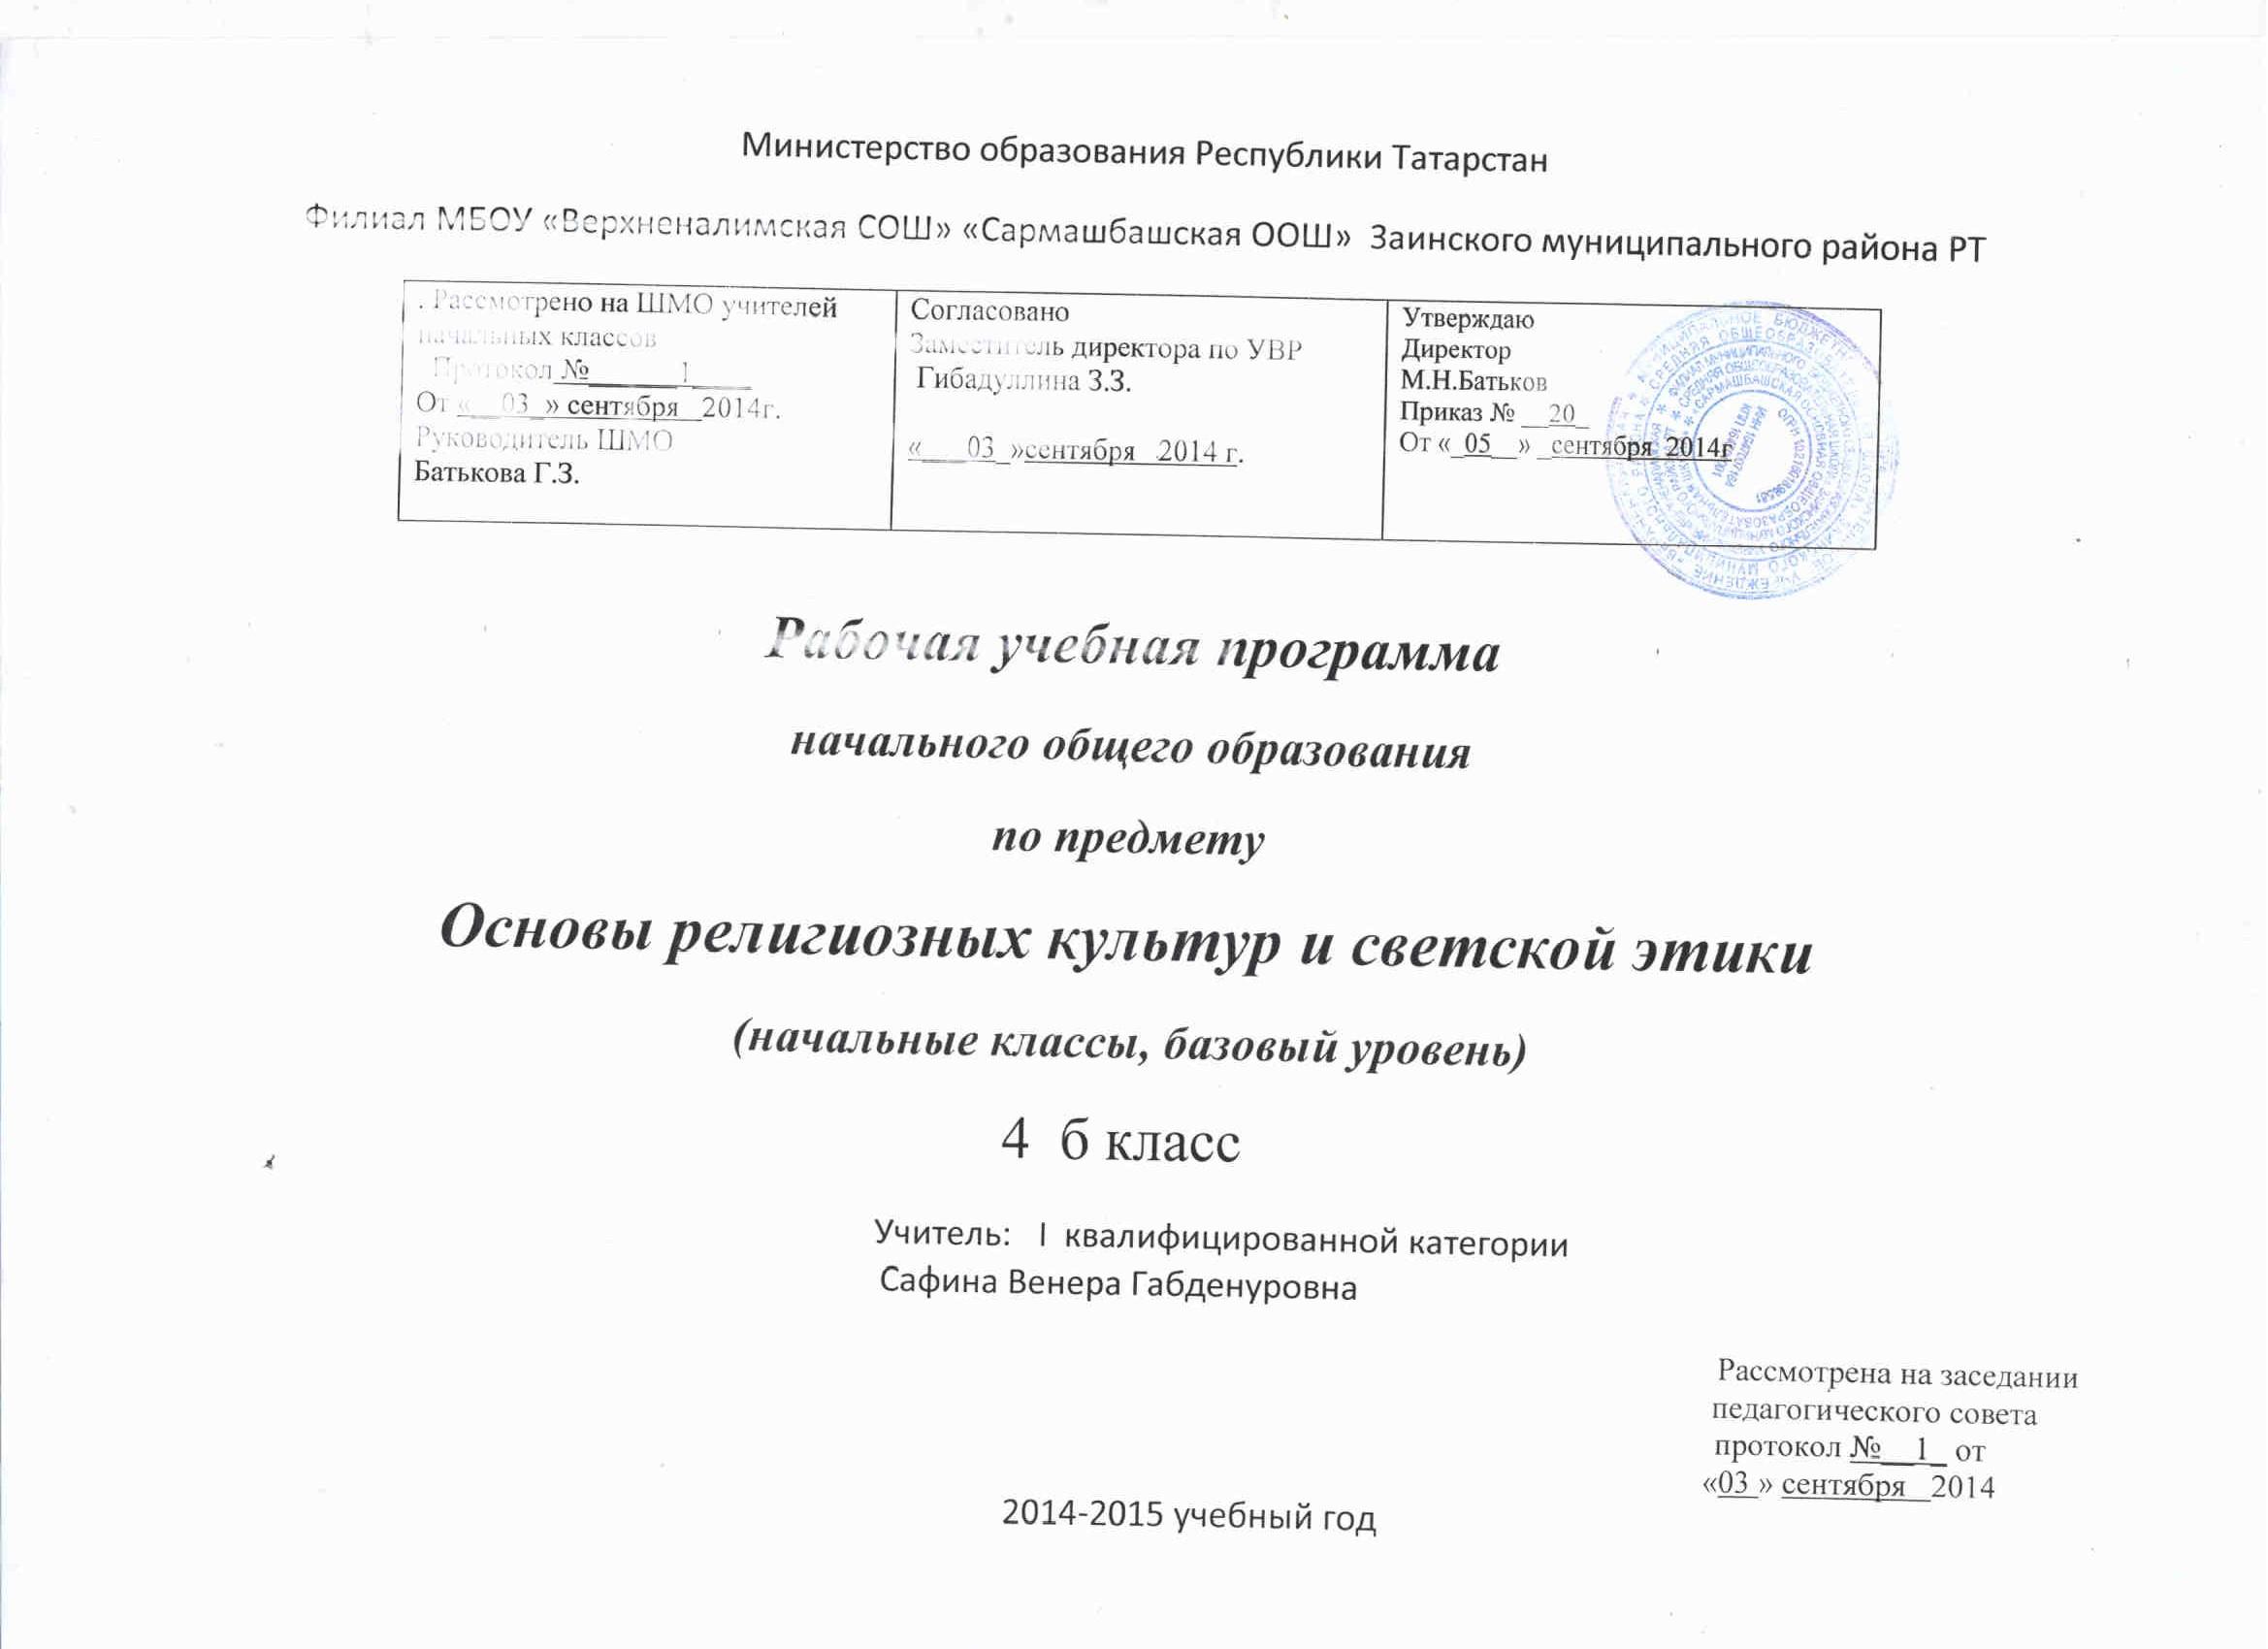 C:\Users\Венера\Documents\Документы сканера\раб пр оркси.jpg